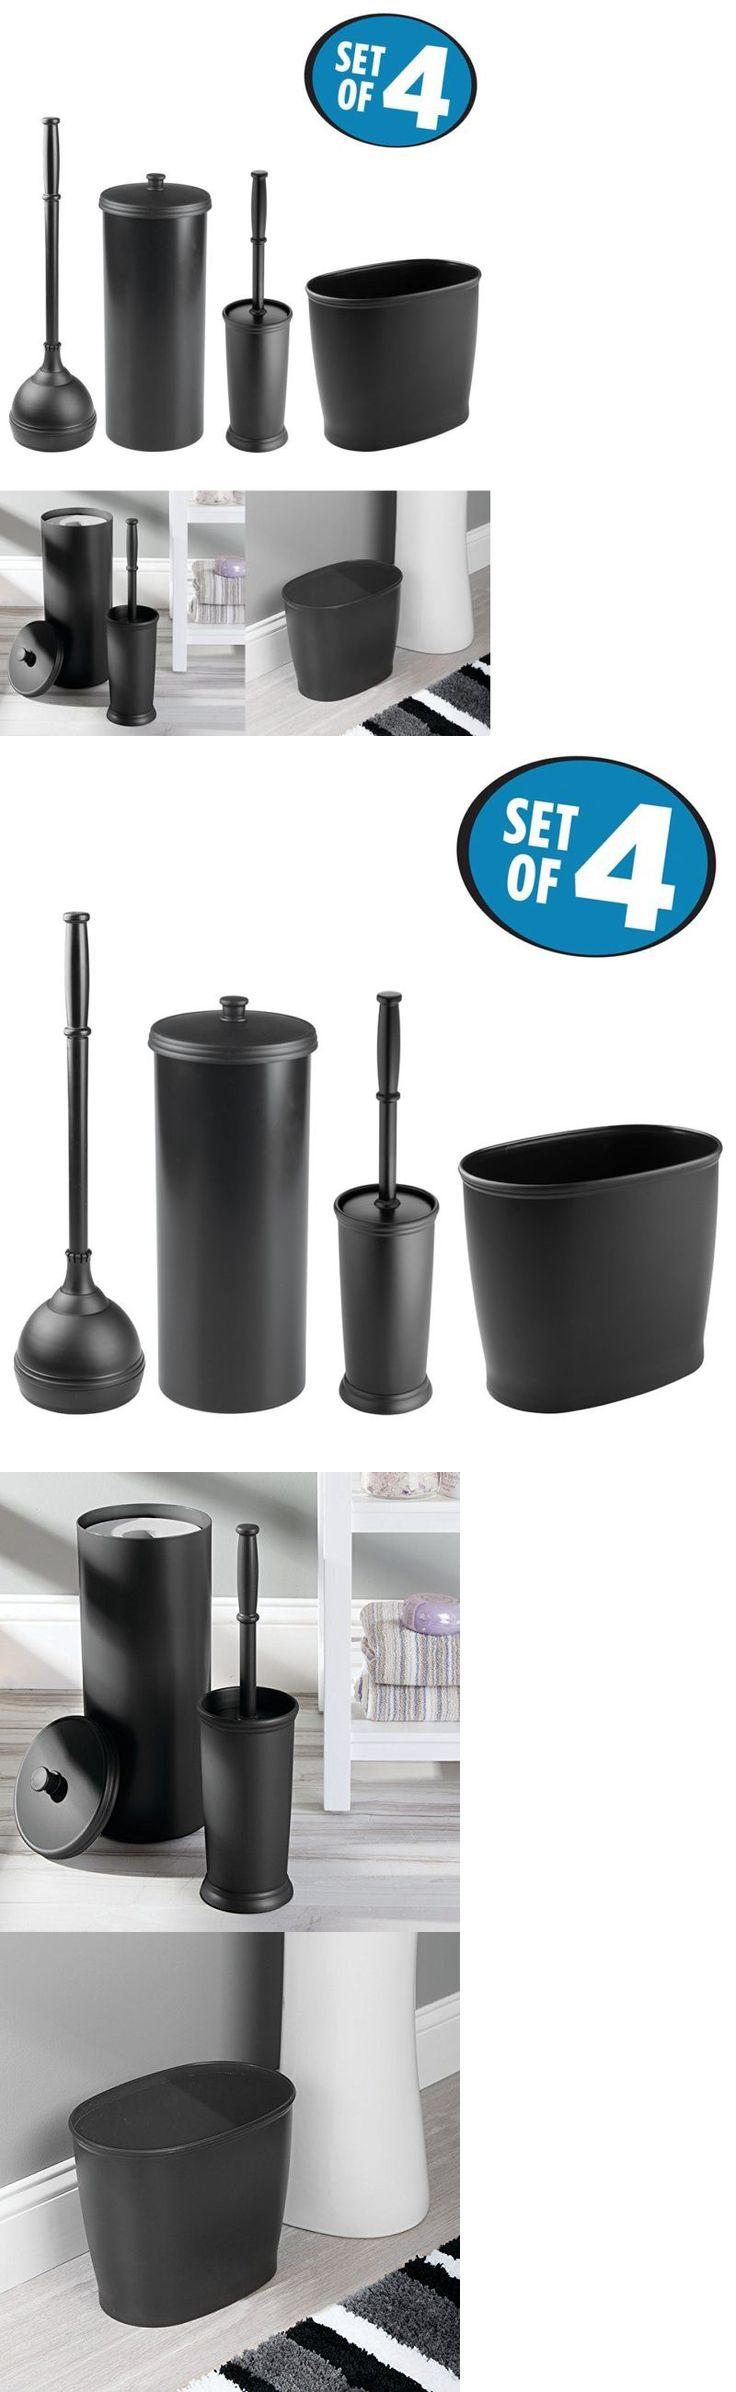 best 25 toilet brush ideas on pinterest tiny bathrooms smart design and small vanity sink. Black Bedroom Furniture Sets. Home Design Ideas